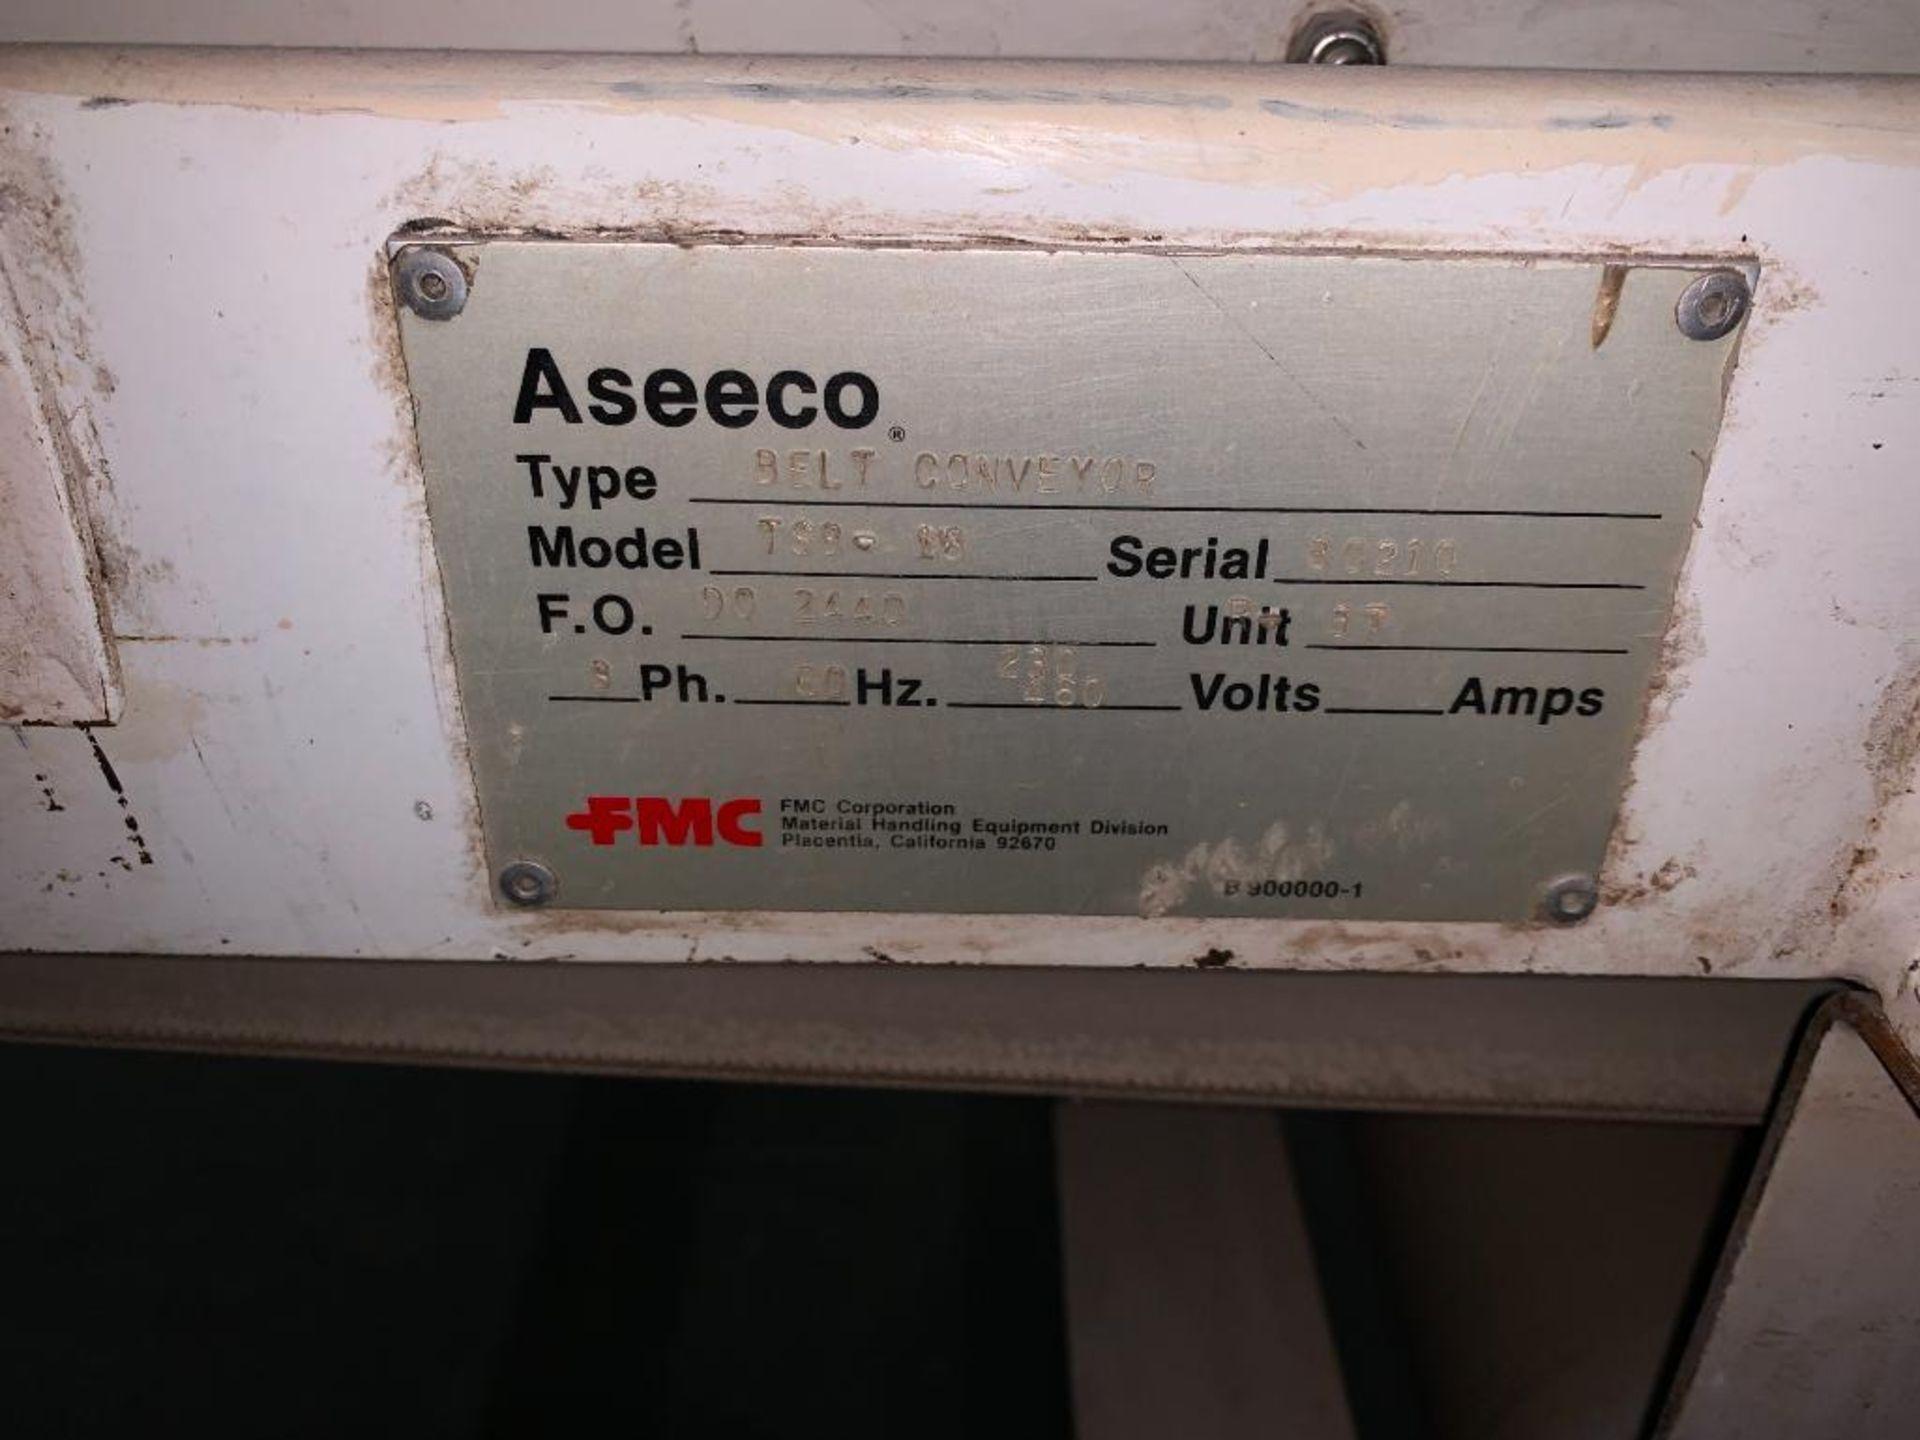 Aseeco mild steel cone bottom bulk storage bin - Image 23 of 27